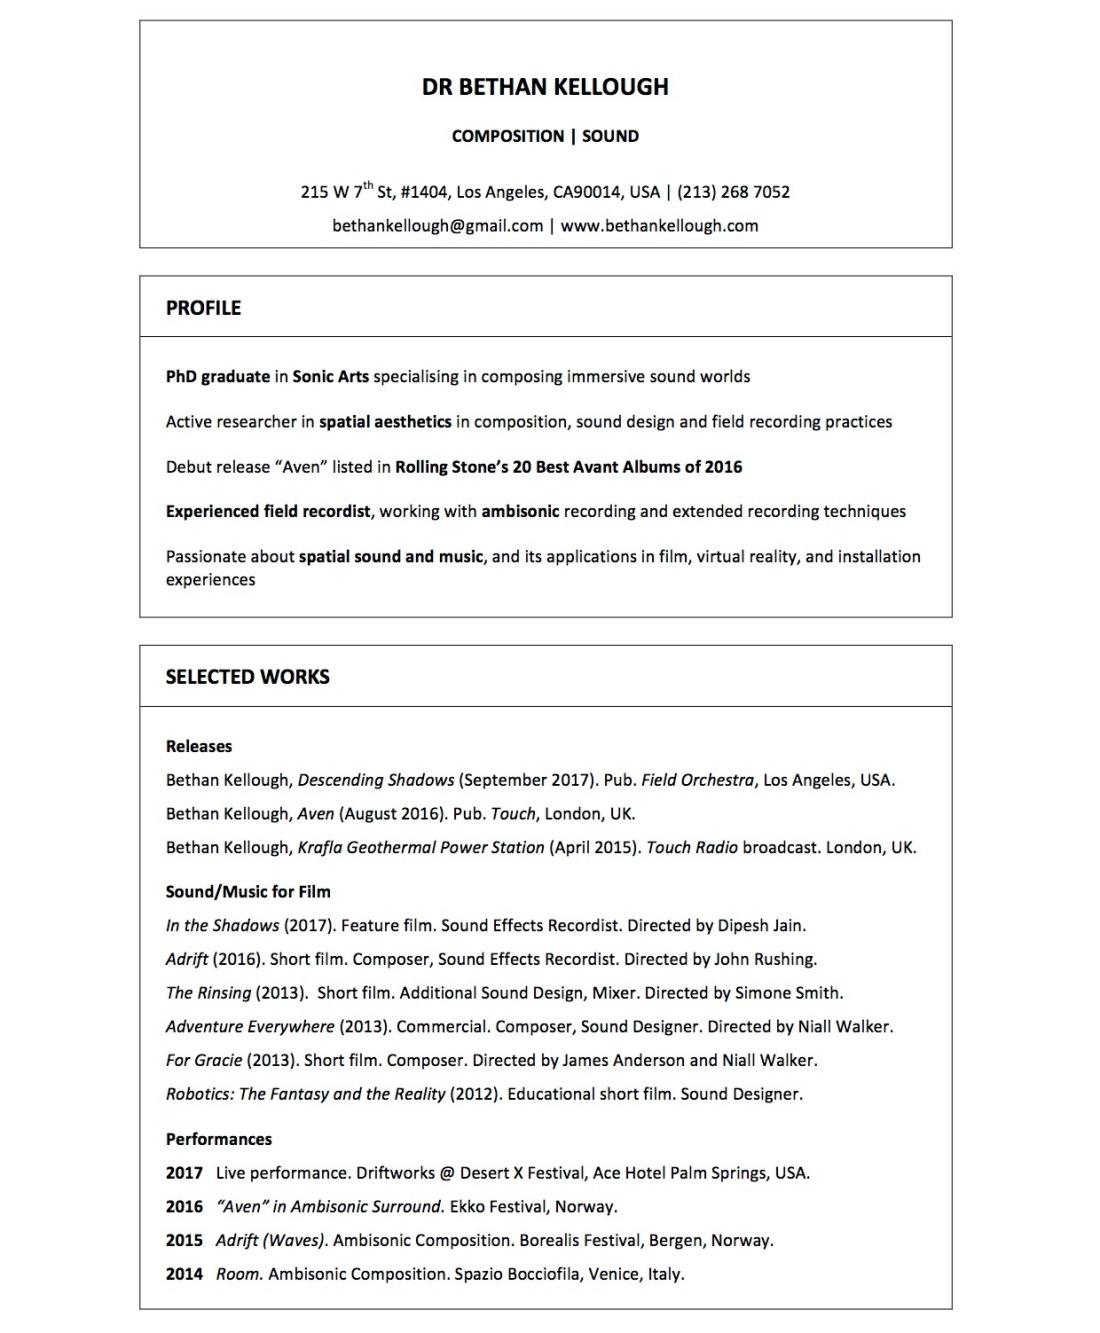 Curriculum Vitae_Dr Bethan Kellough_Composer